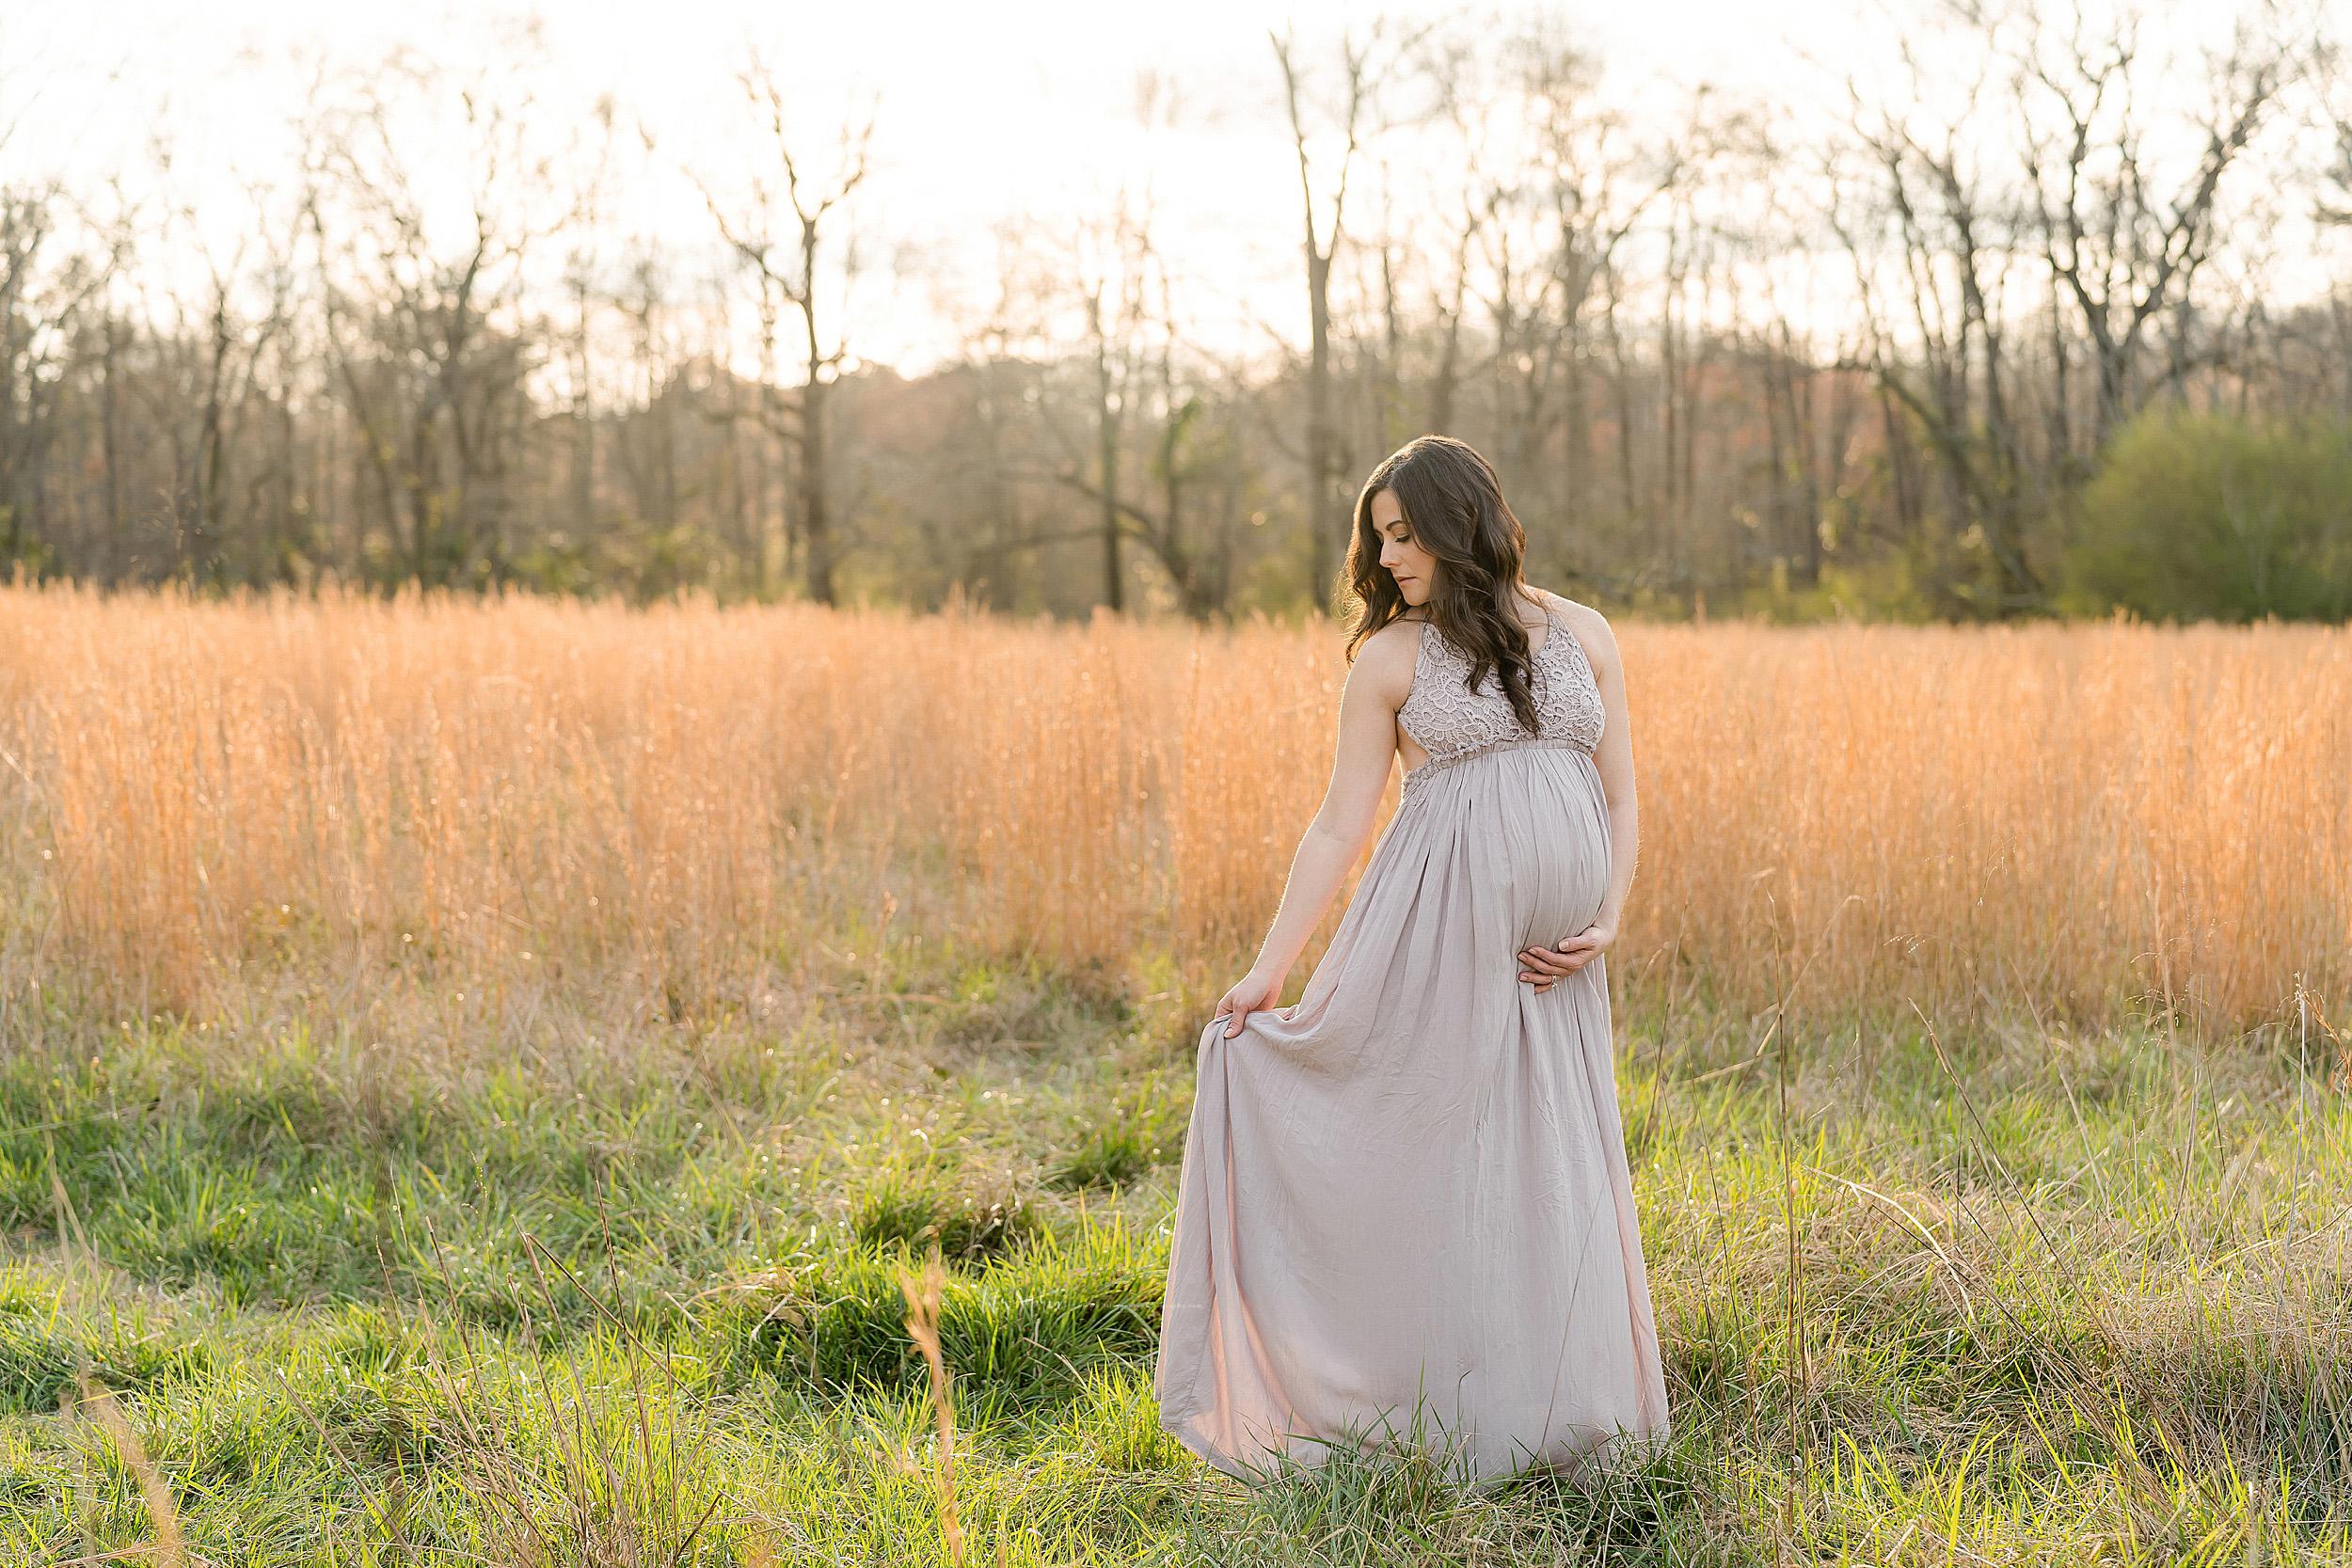 atlanta-brookhaven-alpharetta-sandy-springs-buckhead-virginia-highlands-west-end-decatur-lily-sophia-photography-outdoor-field-sunset-couples-maternity-photos-expecting-baby-girl_1084.jpg